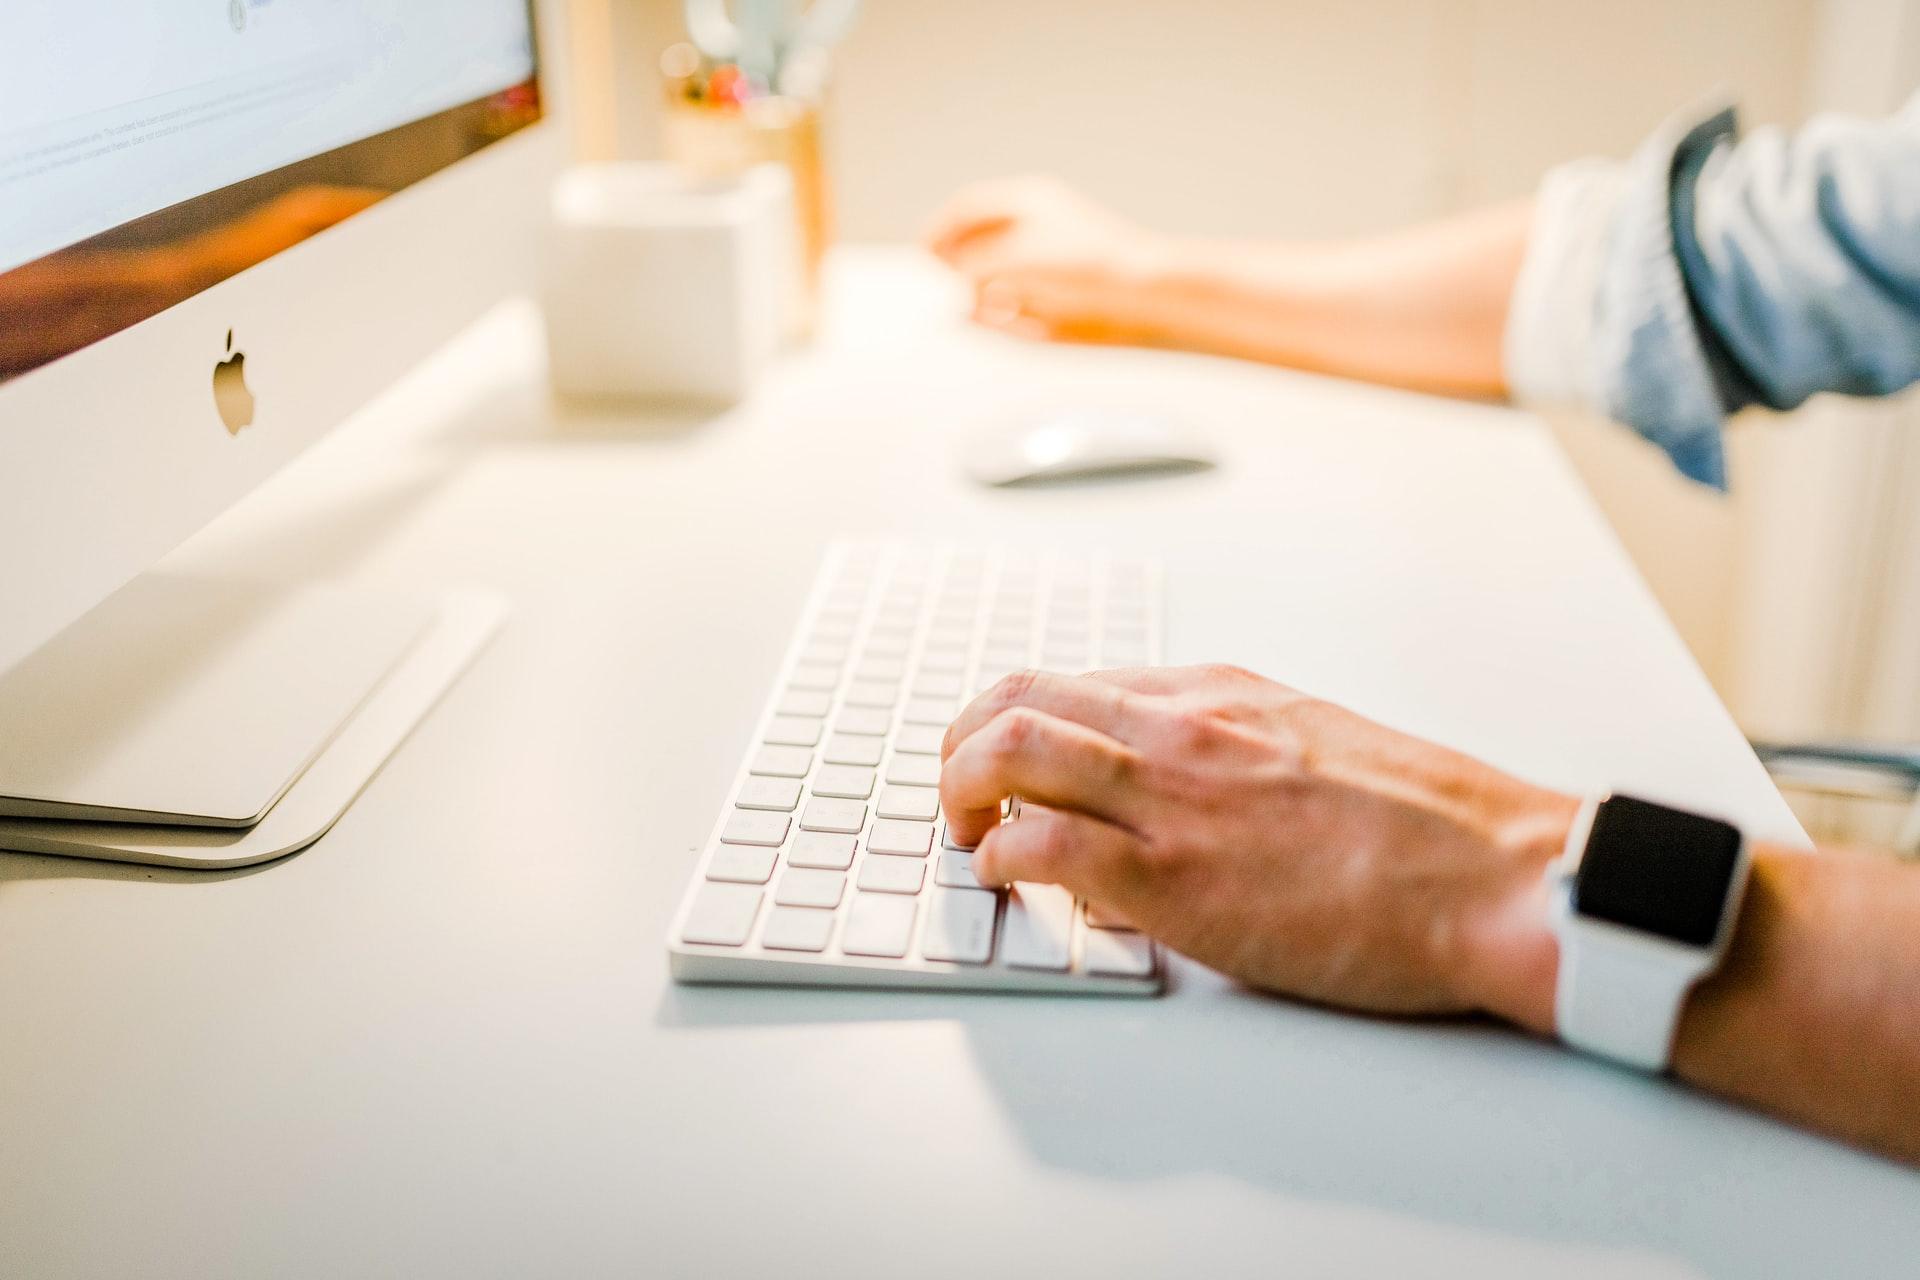 4 Ways To Organize Your Digital Marketing Business for Efficiency